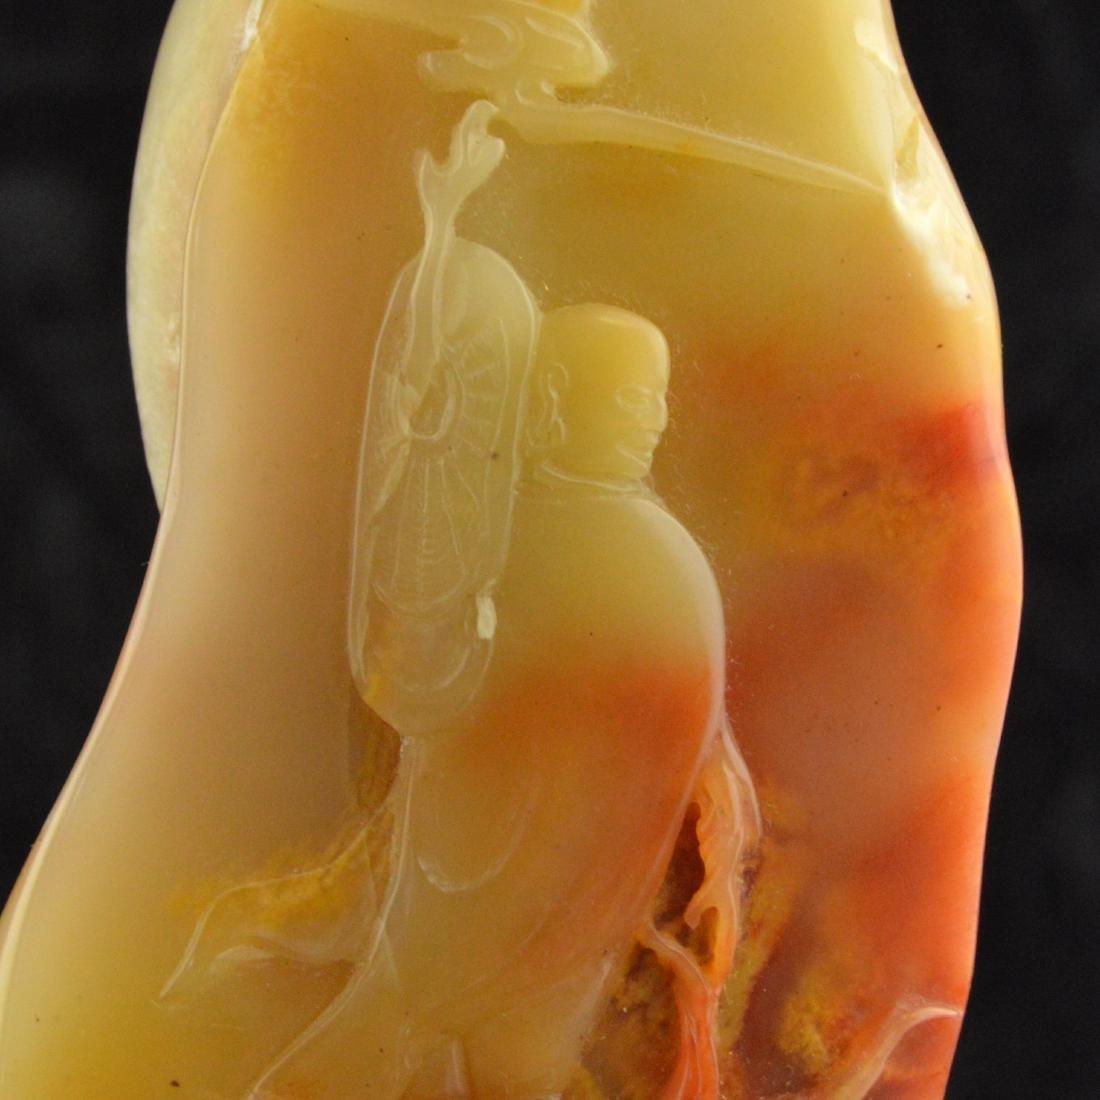 Soapstone Carved Figure Decor - 5